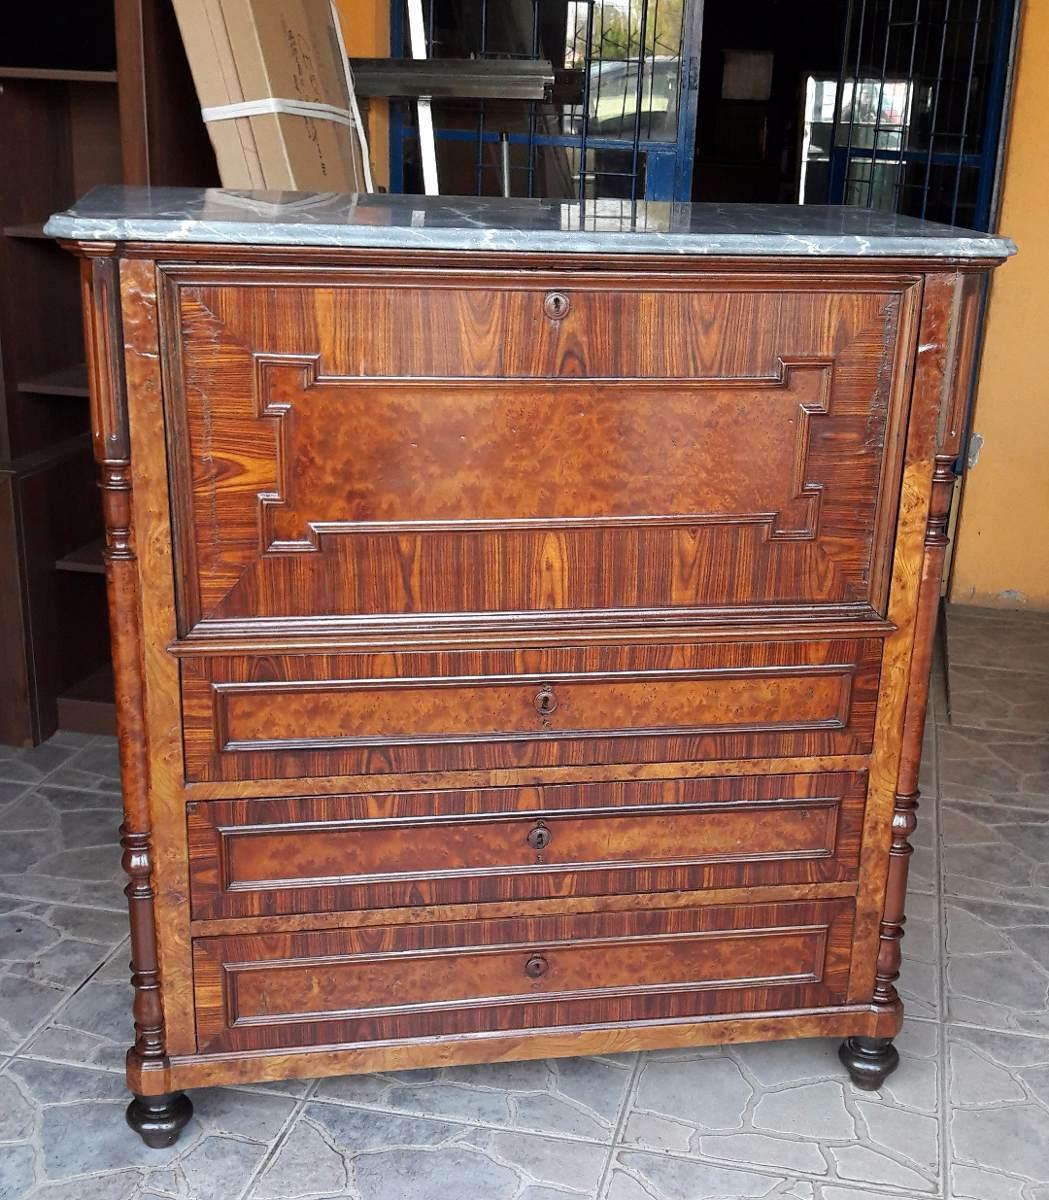 j c antiguo mueble secreter ingles puerta rebatible. Black Bedroom Furniture Sets. Home Design Ideas